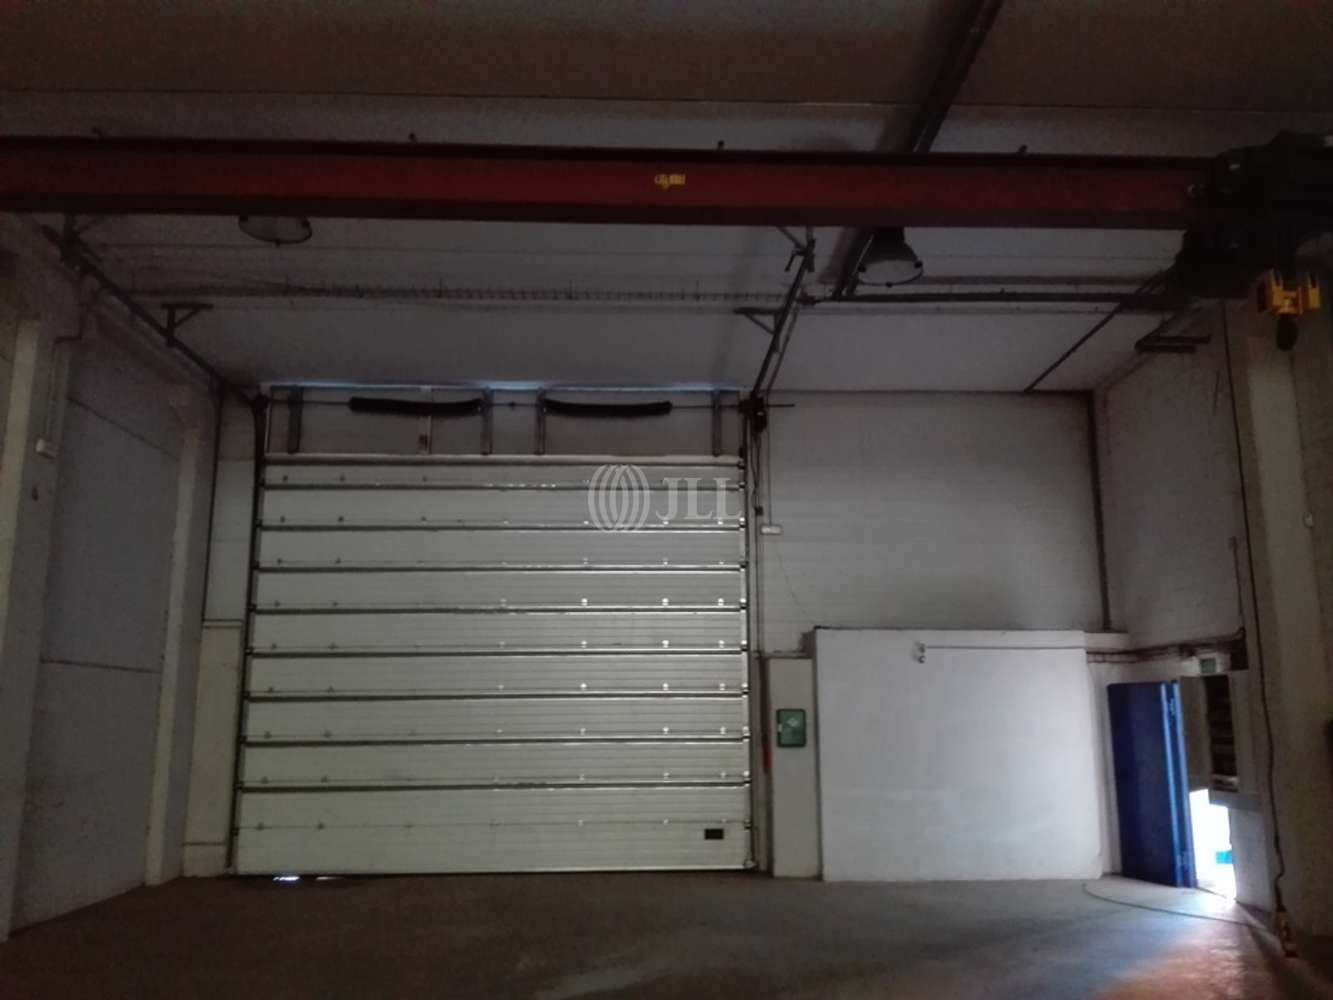 Naves industriales y logísticas Sant boi de llobregat, 08830 - Nave Industrial - B0338 - PI FONOLLAR NORD - 6226